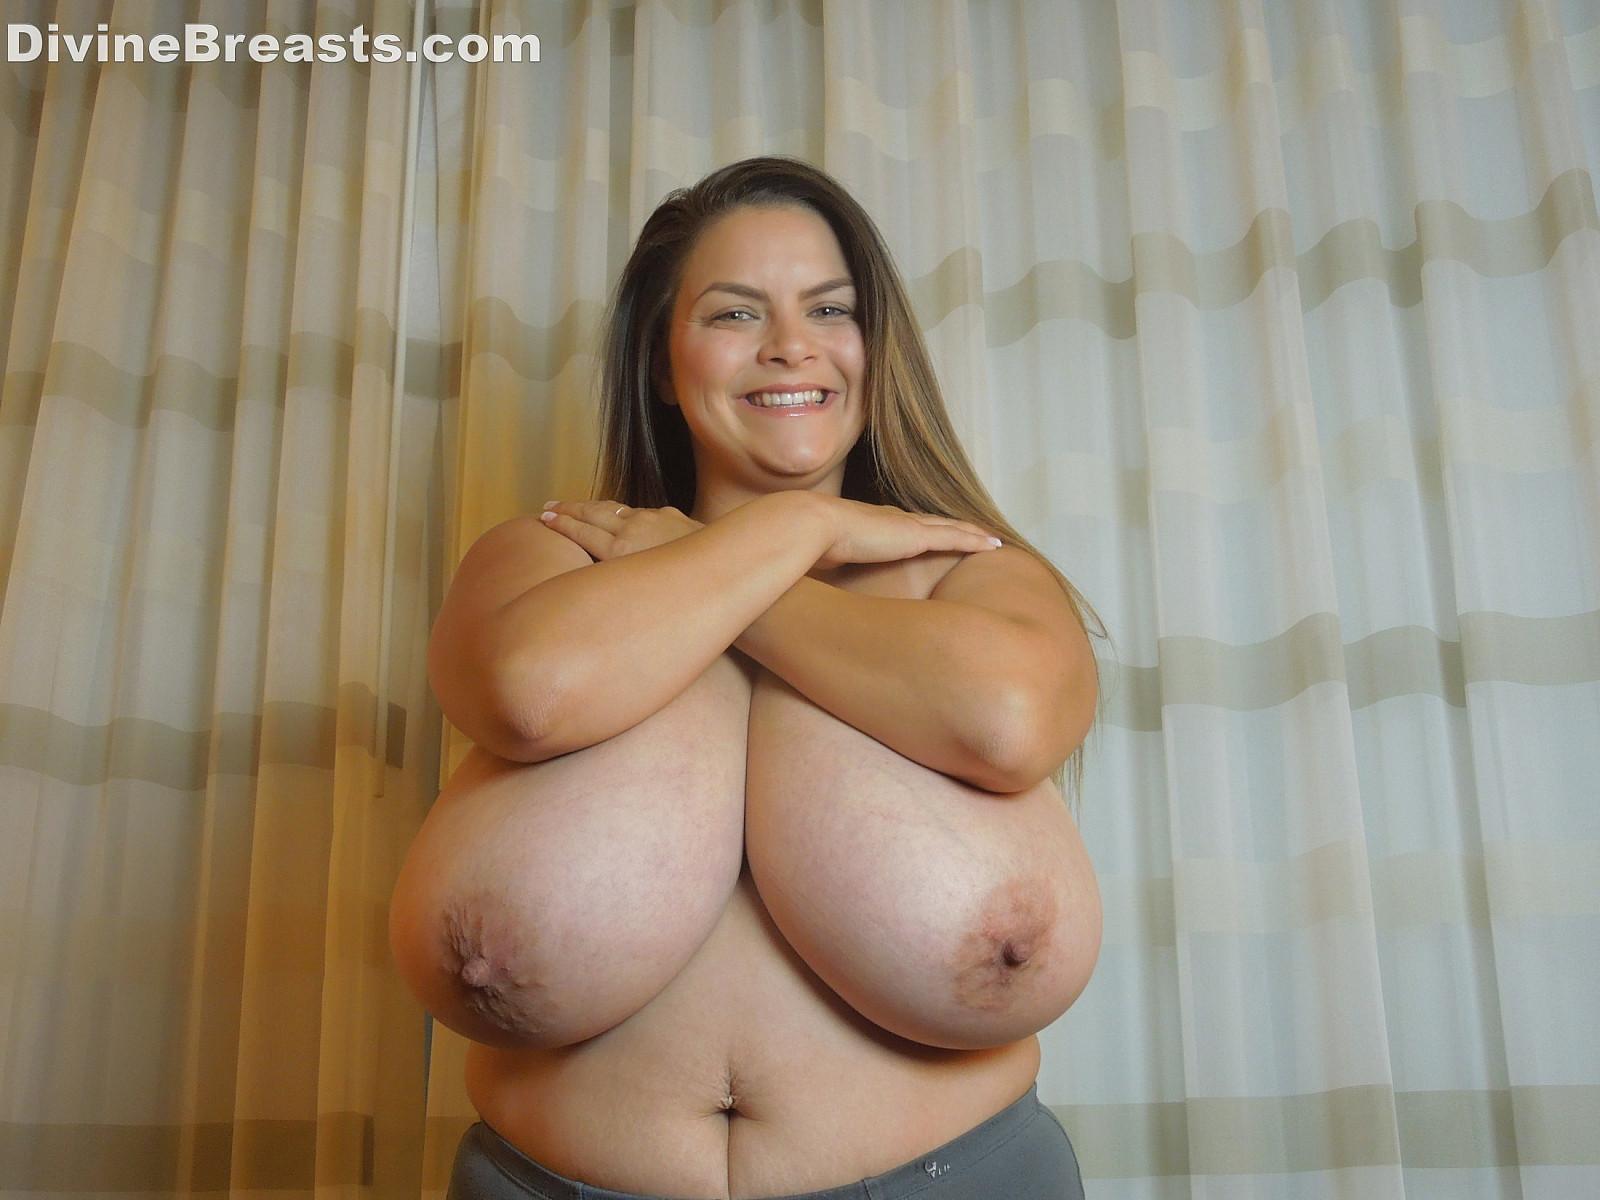 Tessa fowler blue crush 5d 1 - 1 5